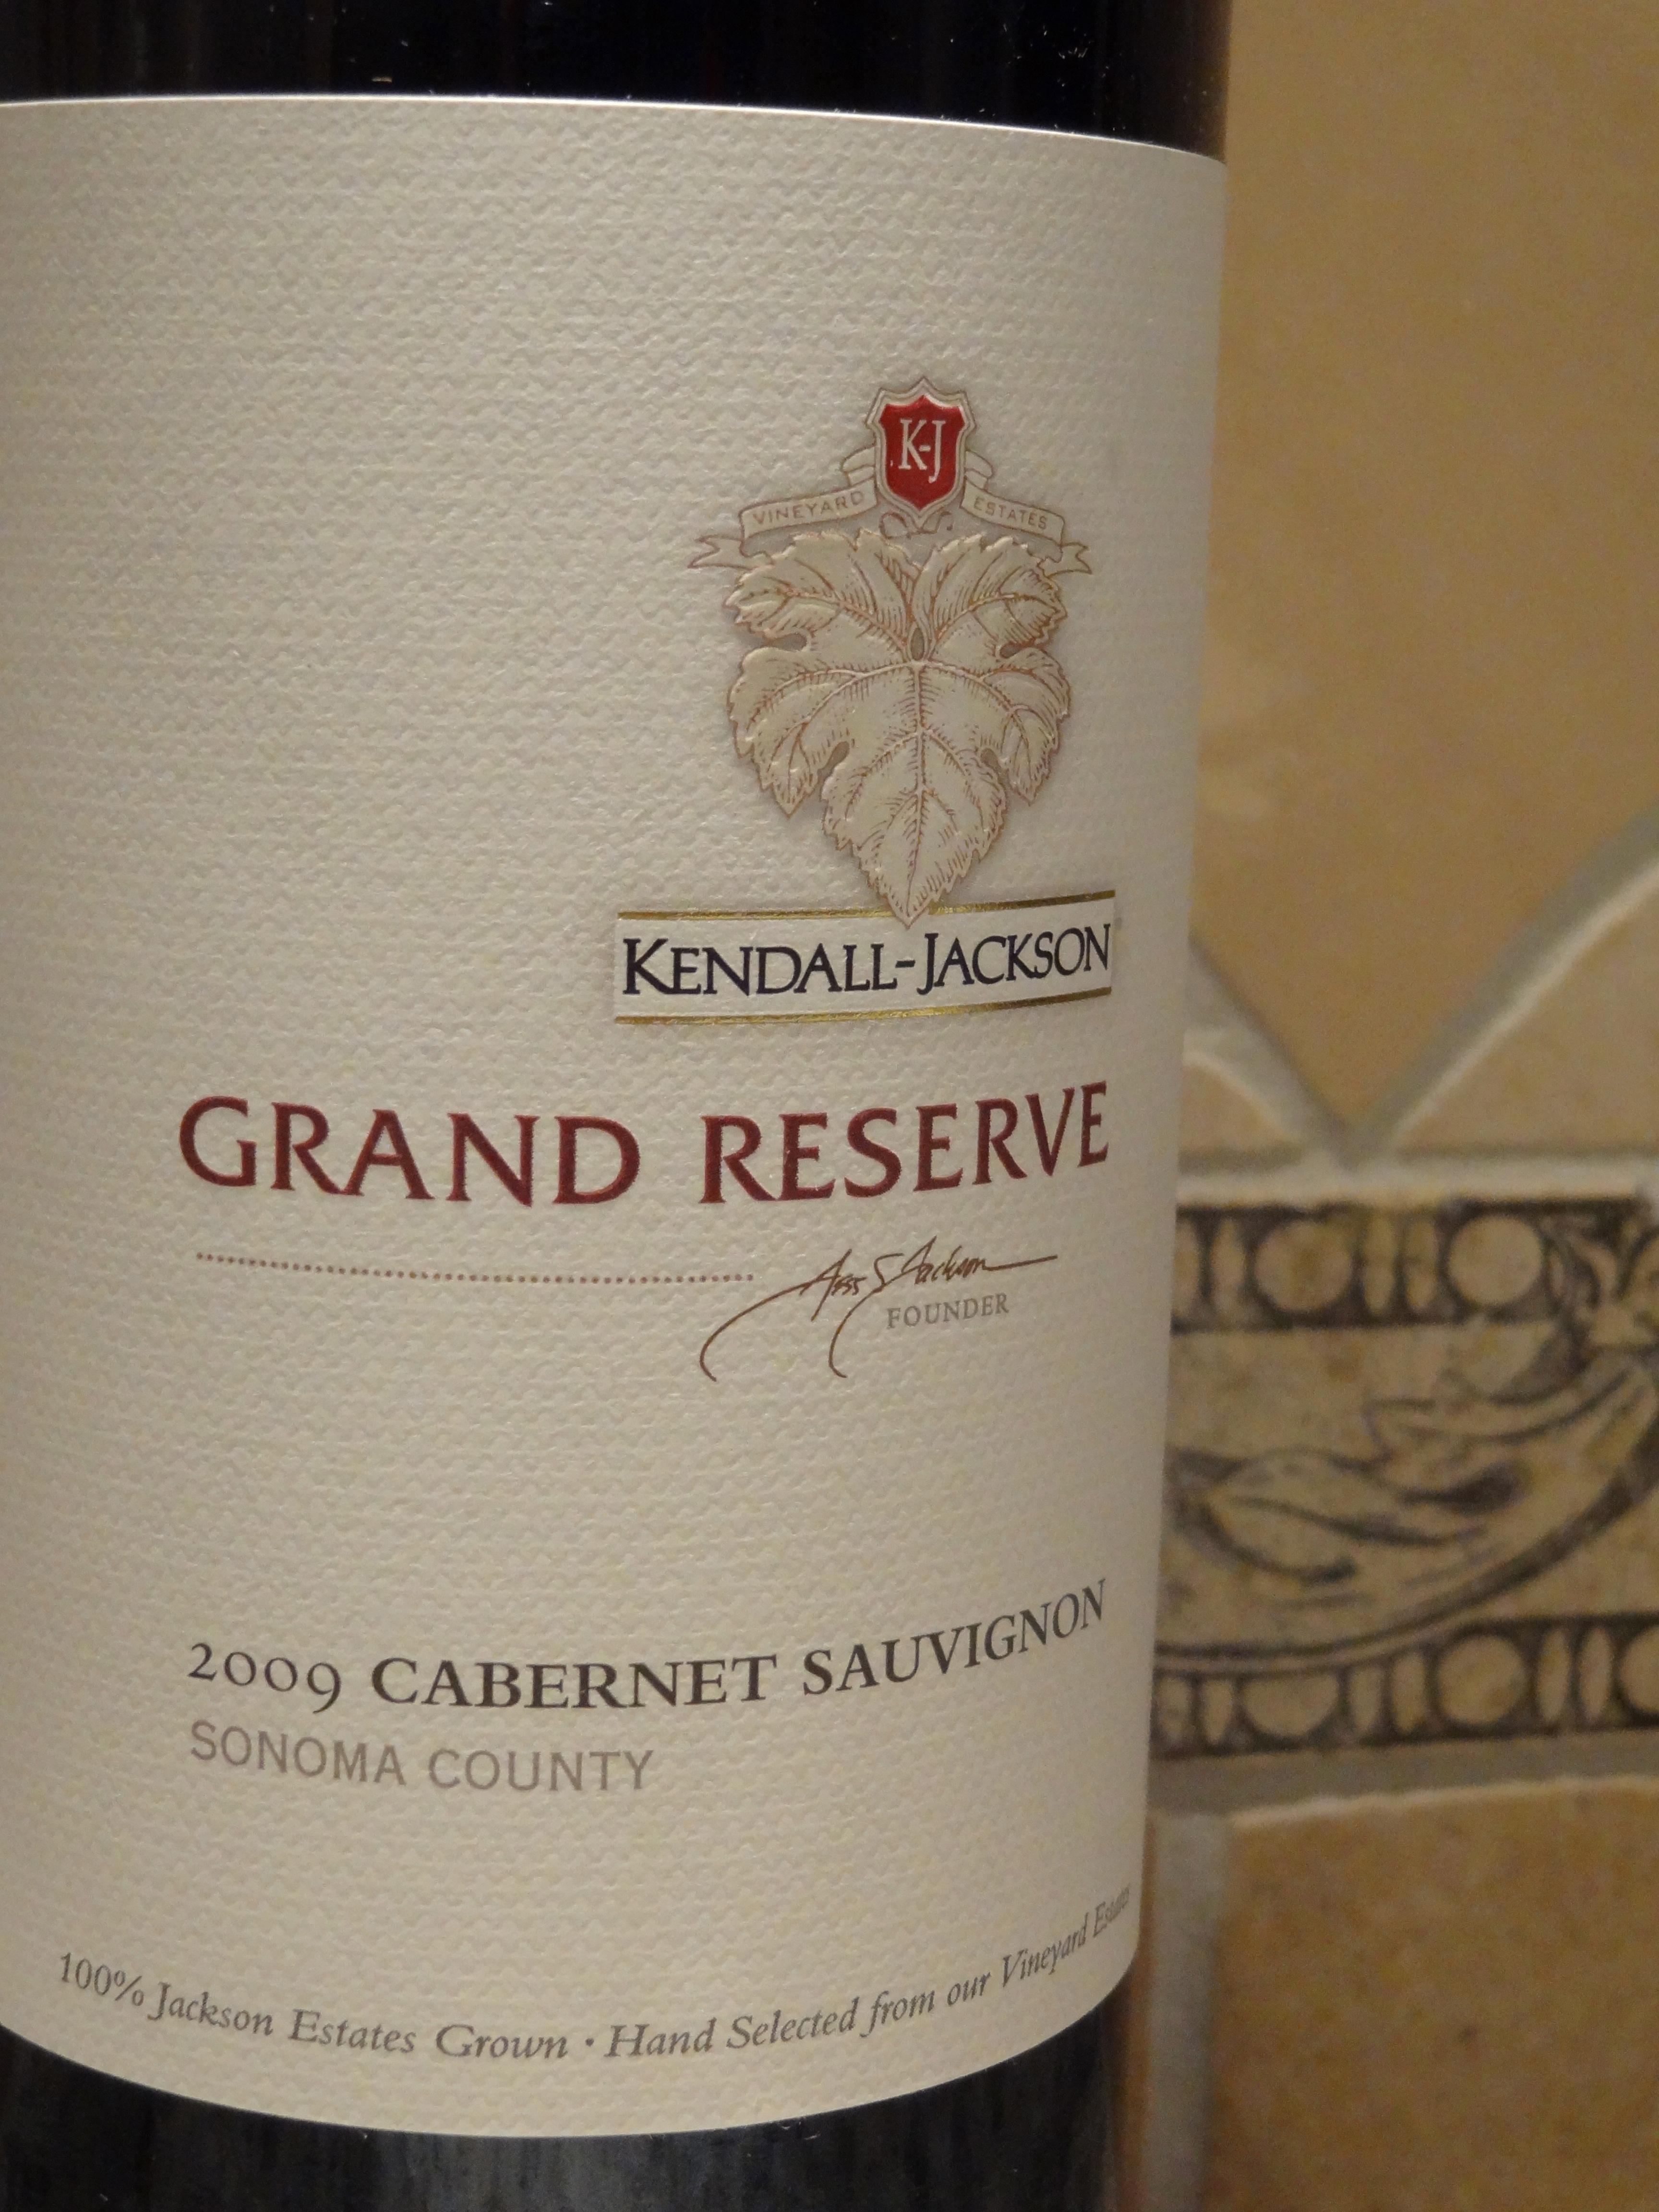 2009 Kendall-Jackson Grand Reserve Cabernet Sauvignon